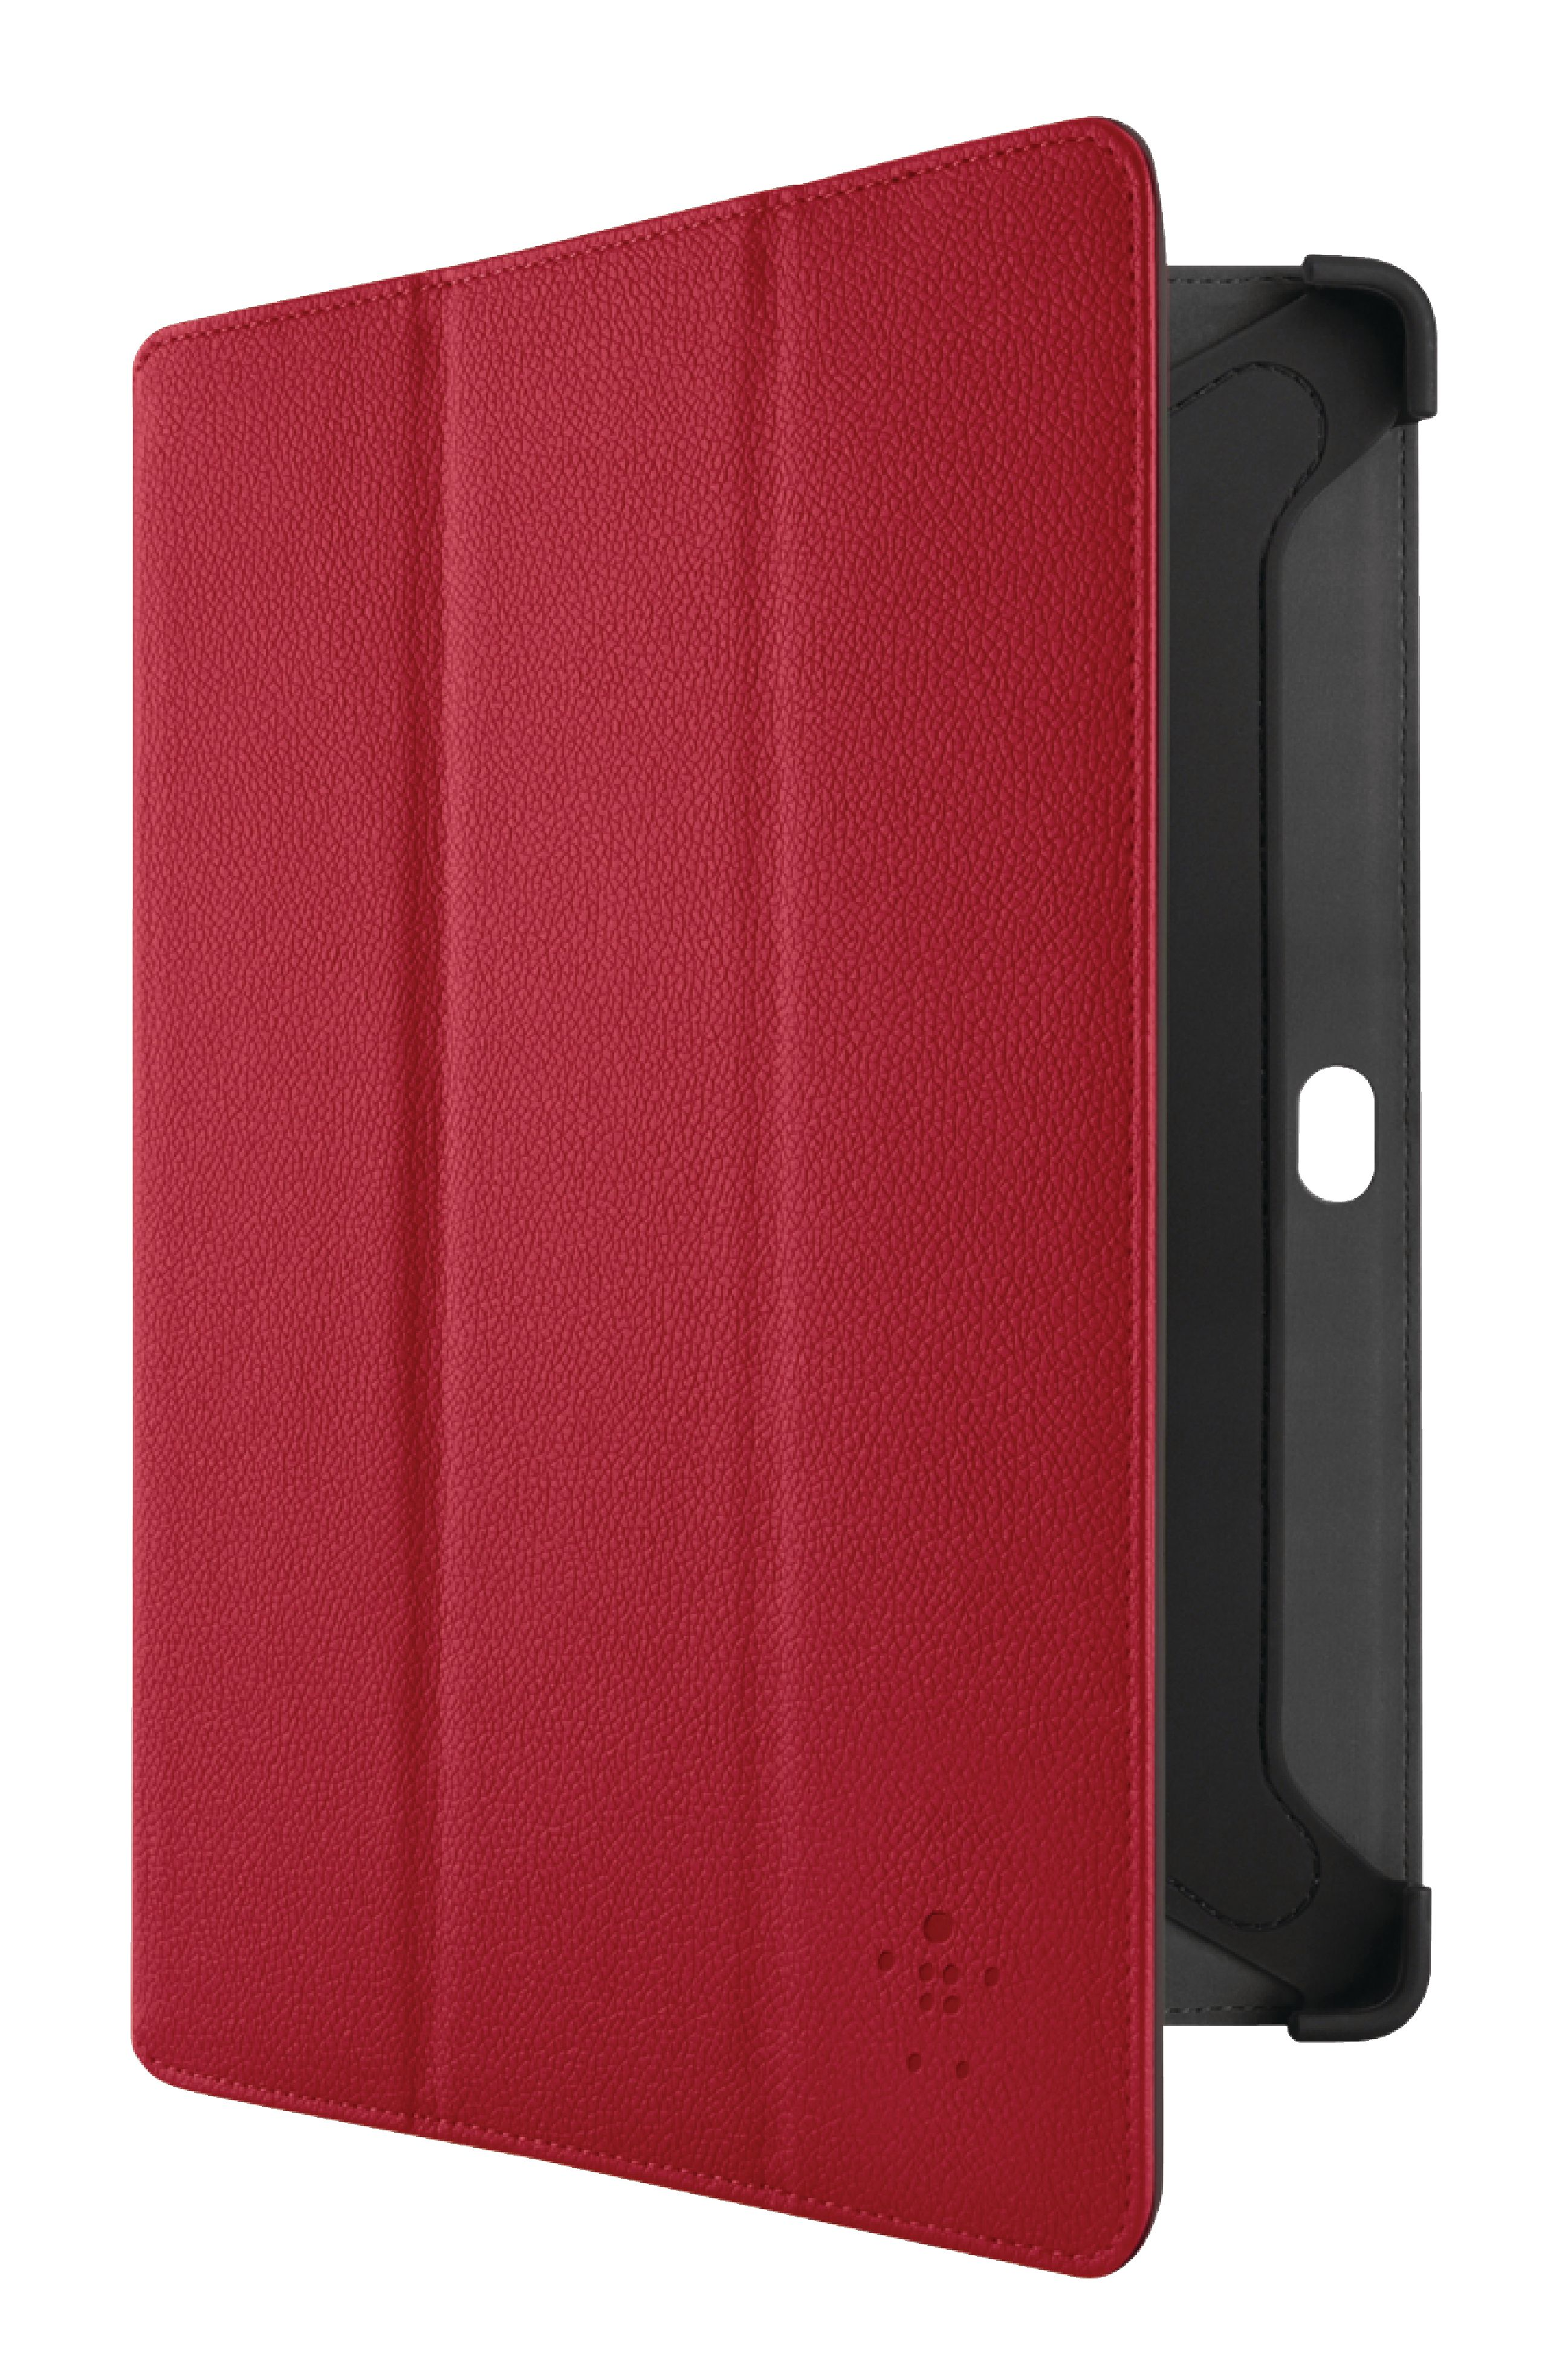 "Billede af Tablet Folie Samsung Galaxy Tab 2 10.1"" Rød"